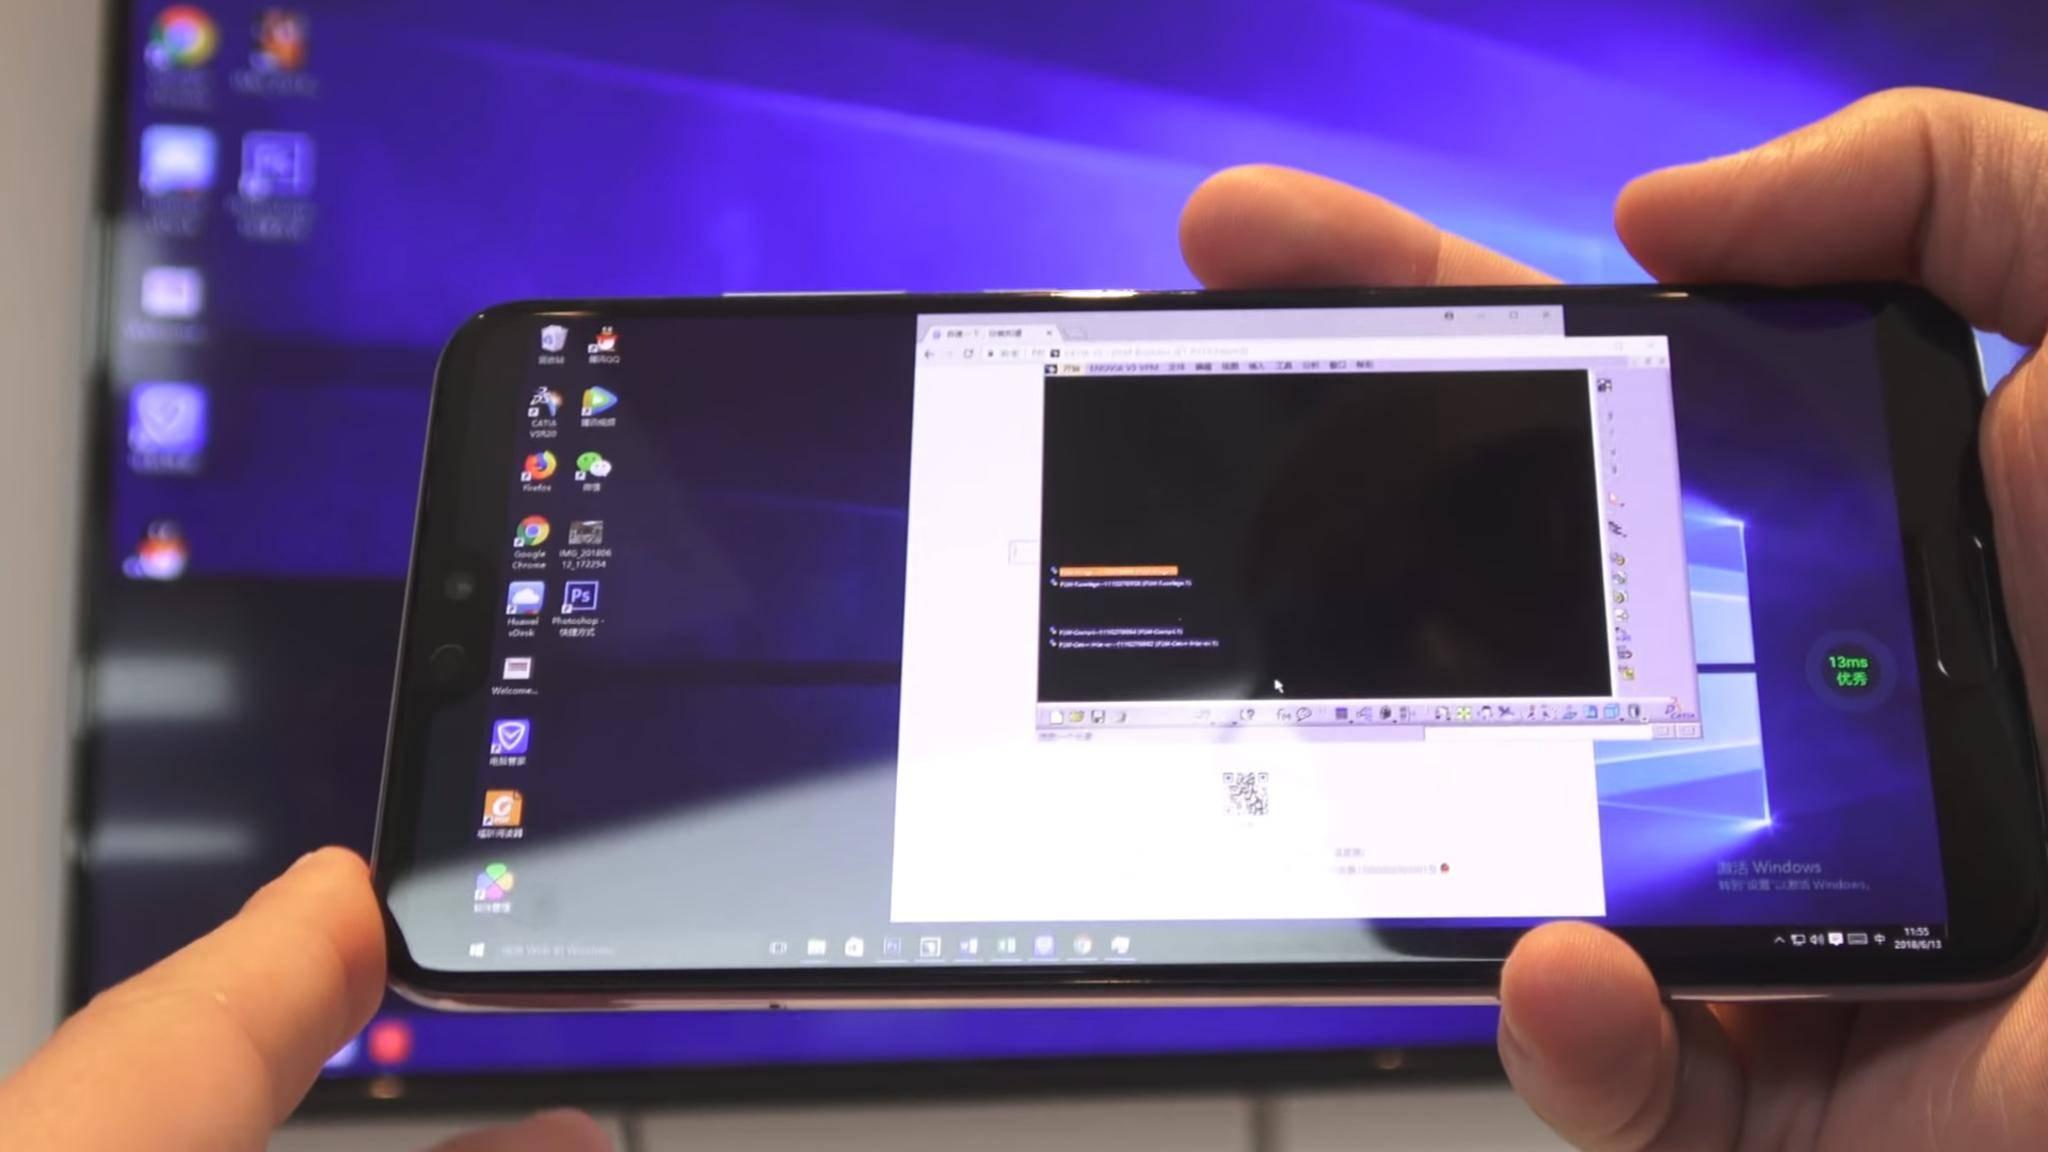 Dank Cloud läuft Windows 10 auf bestimmten Huawei-Handys.